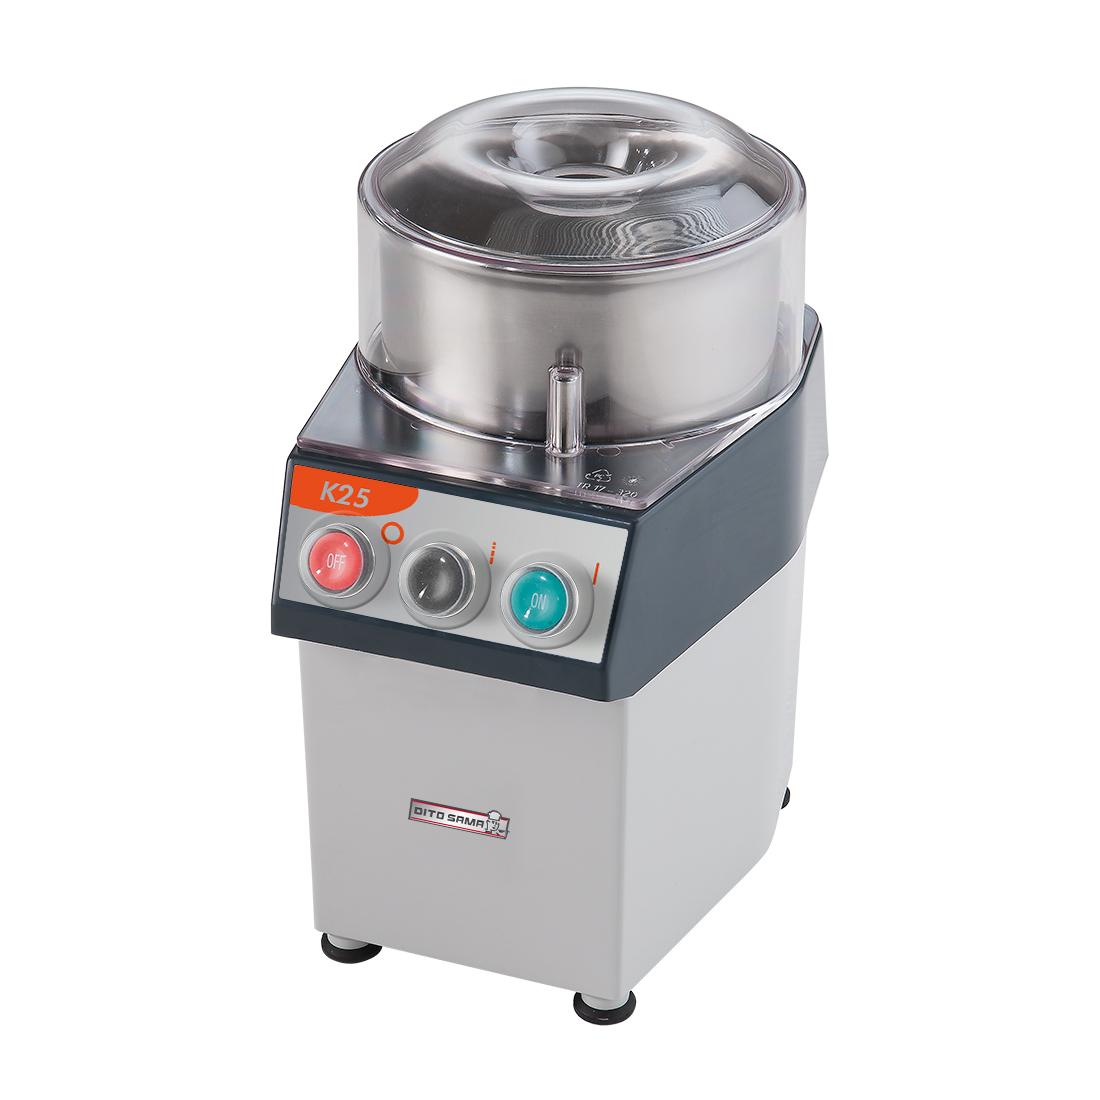 Dito Sama Food processor 2.5 litre single speed 370w - K25